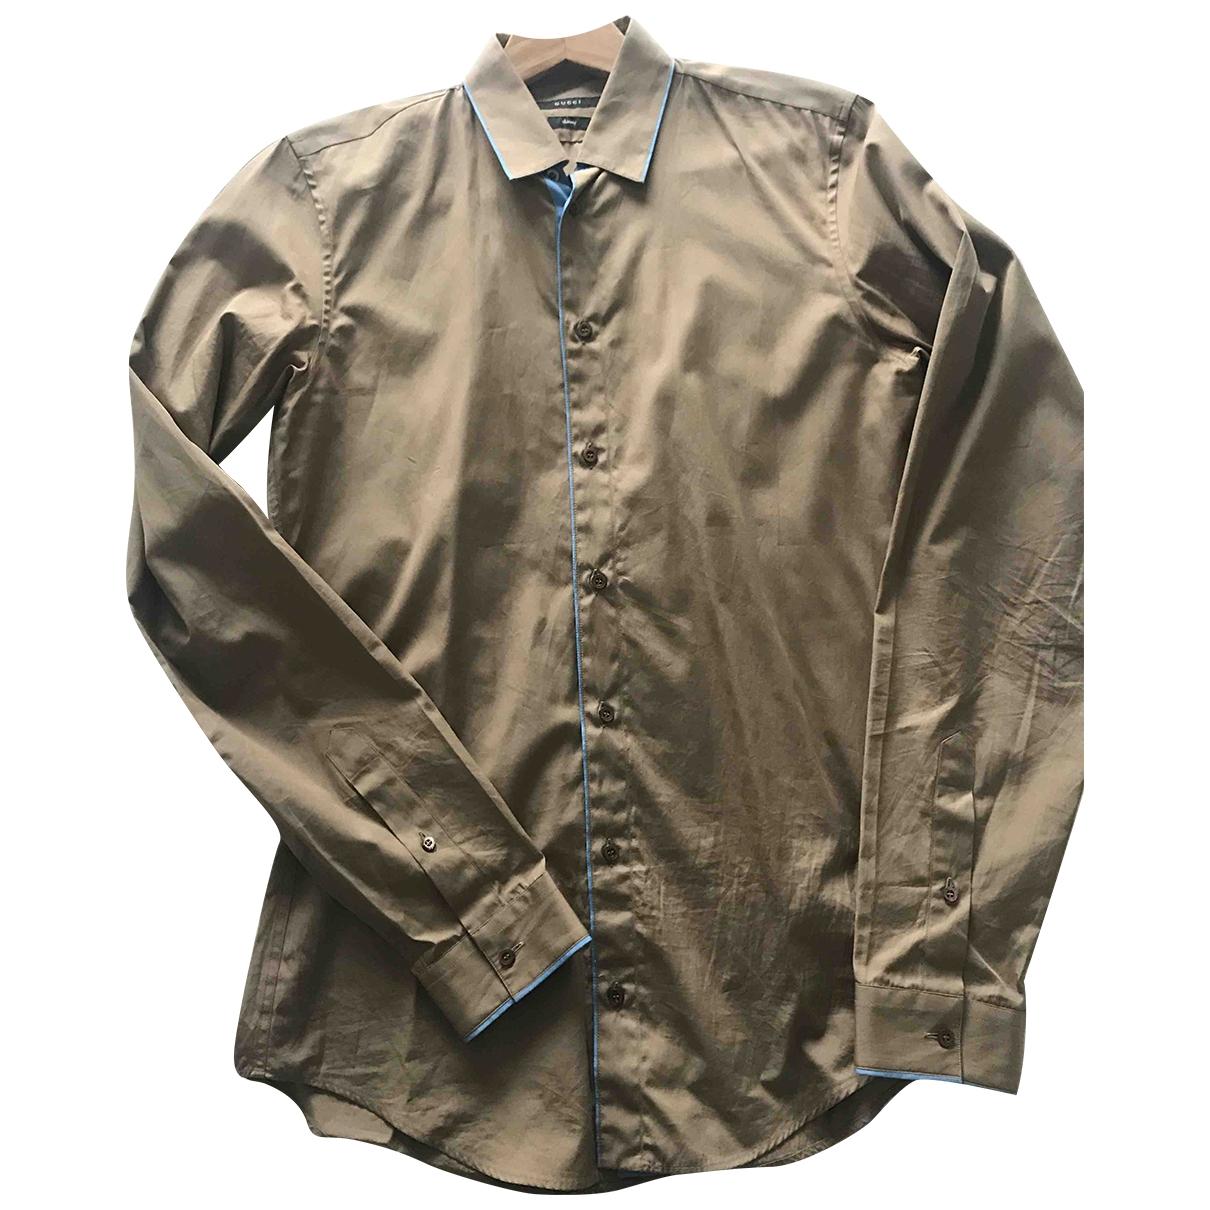 Gucci \N Beige Cotton Shirts for Men 39 EU (tour de cou / collar)